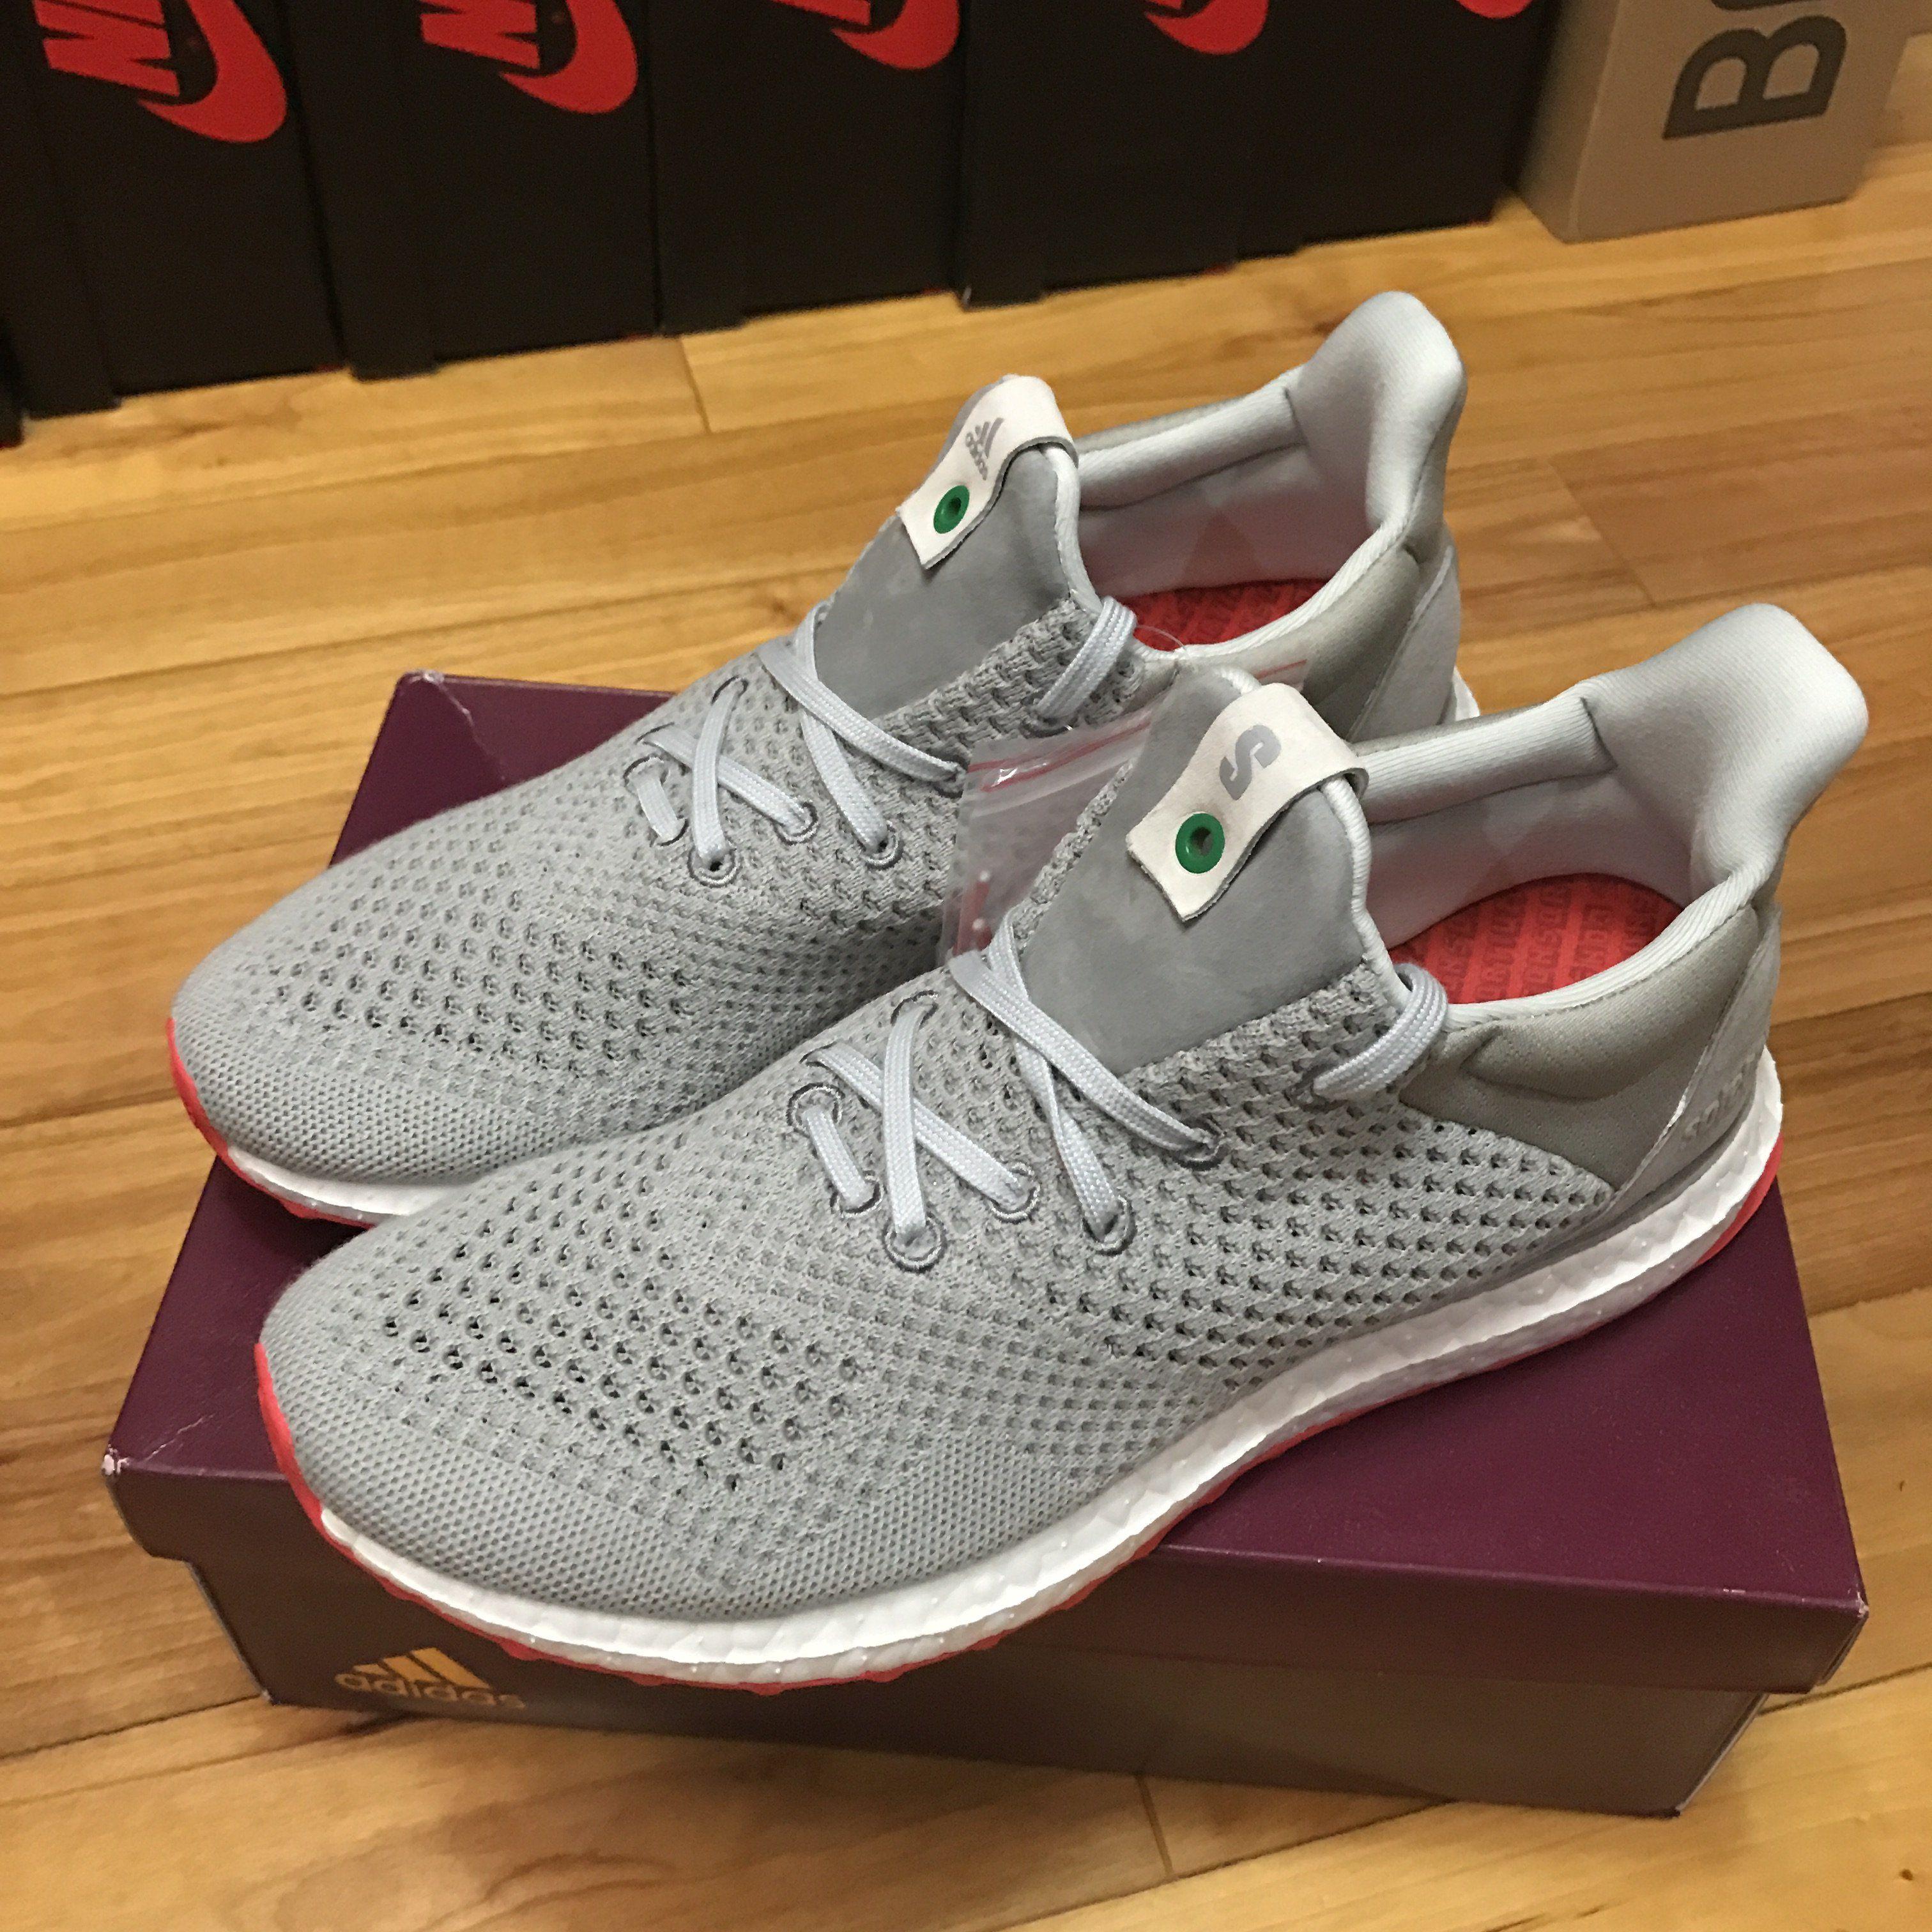 Adidas s80338 ultra Boost uncaged solebox s80338 Adidas zapatos Pinterest e4c02e